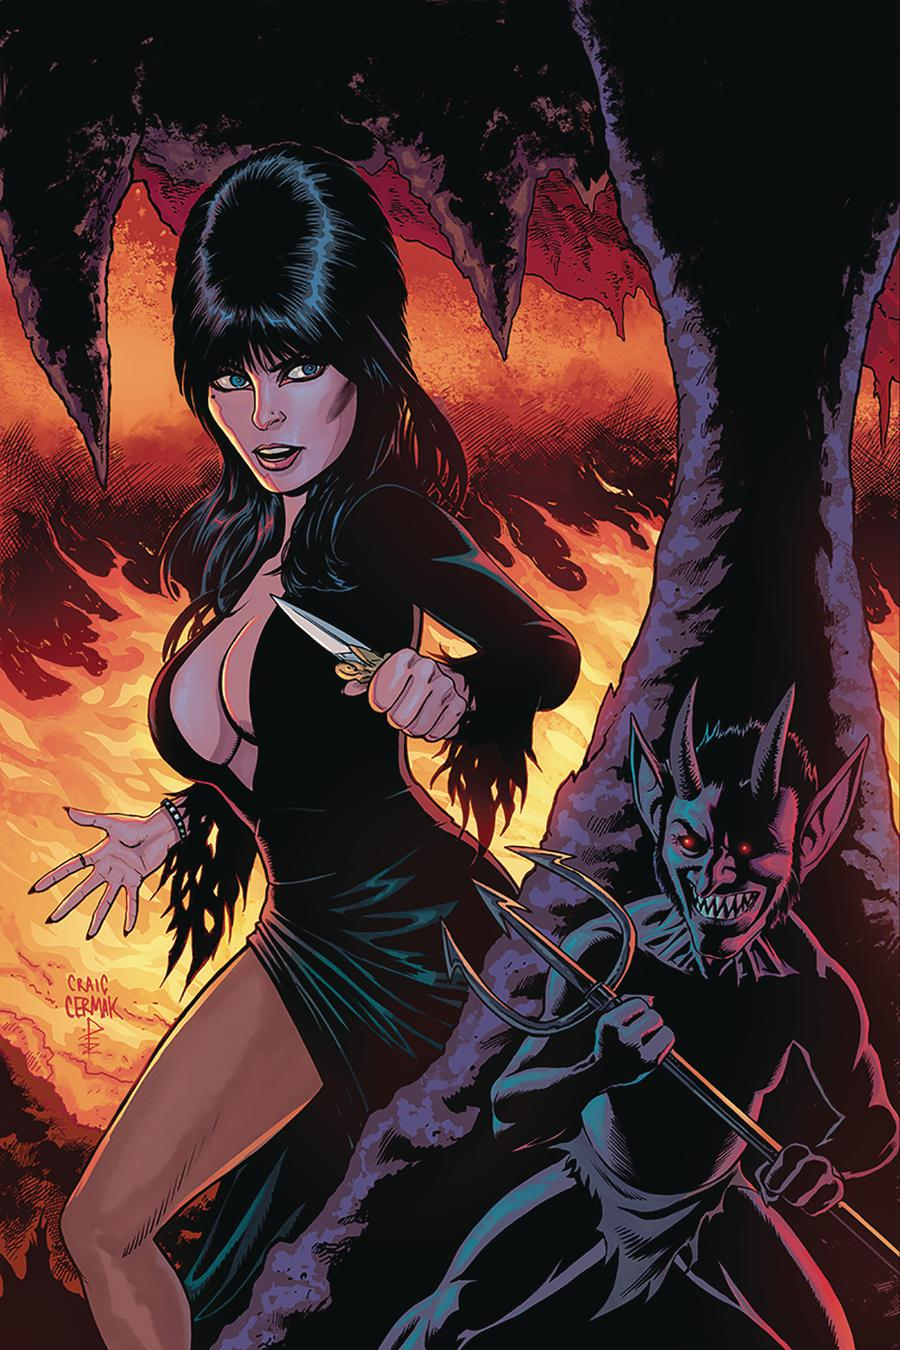 Elvira Mistress Of The Dark Vol 2 #8 Cover F Incentive Craig Cermak Virgin Cover